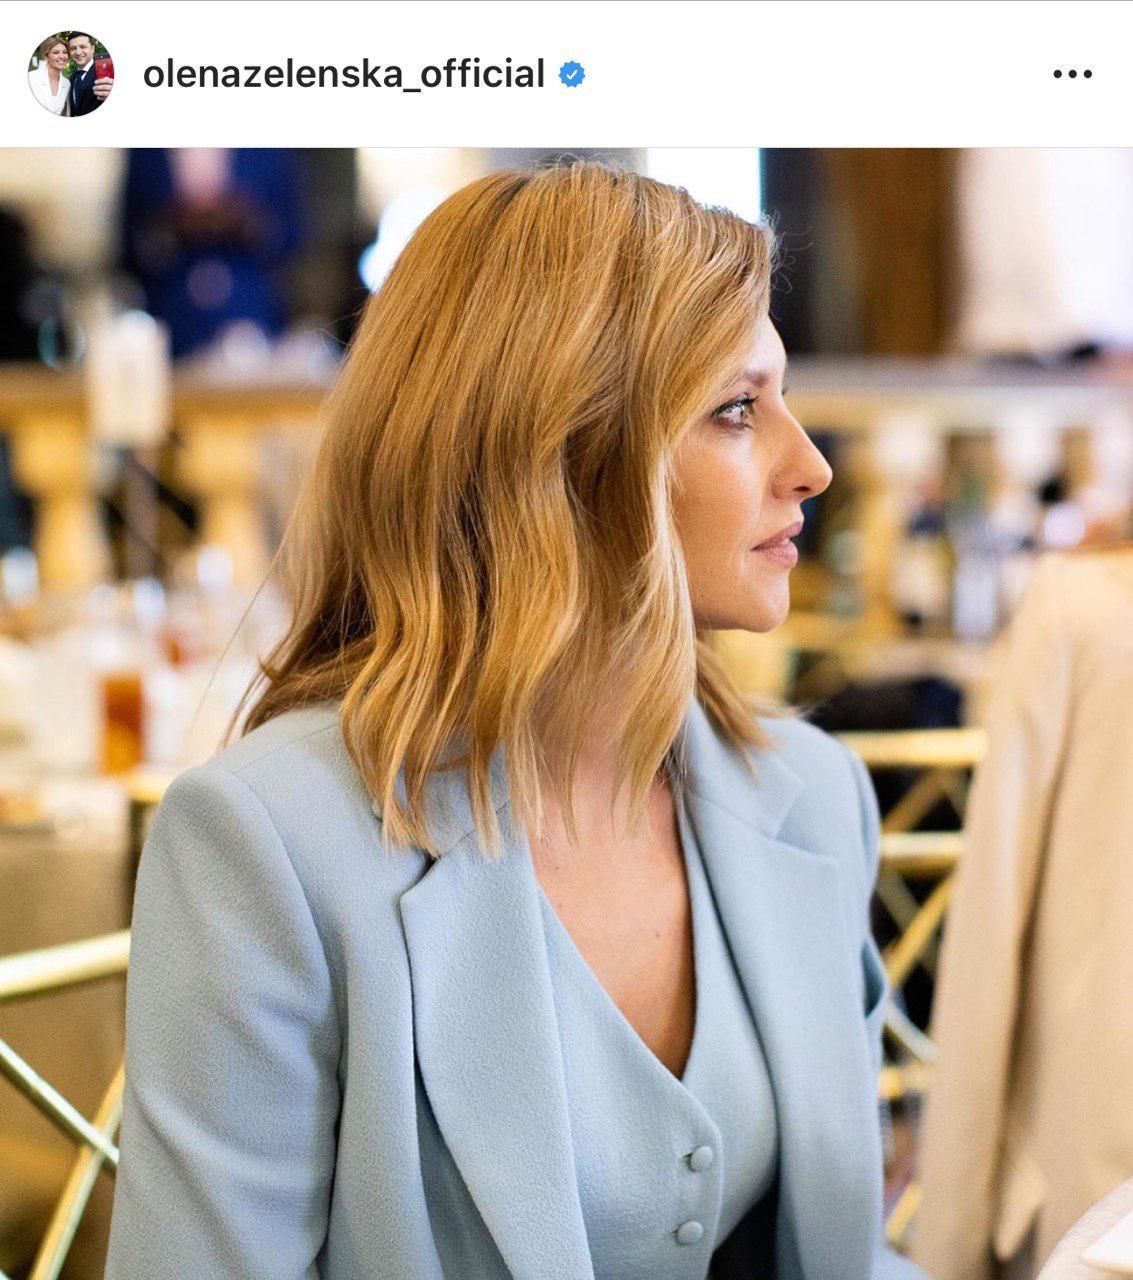 Фото © instagram/olenazelenska_official